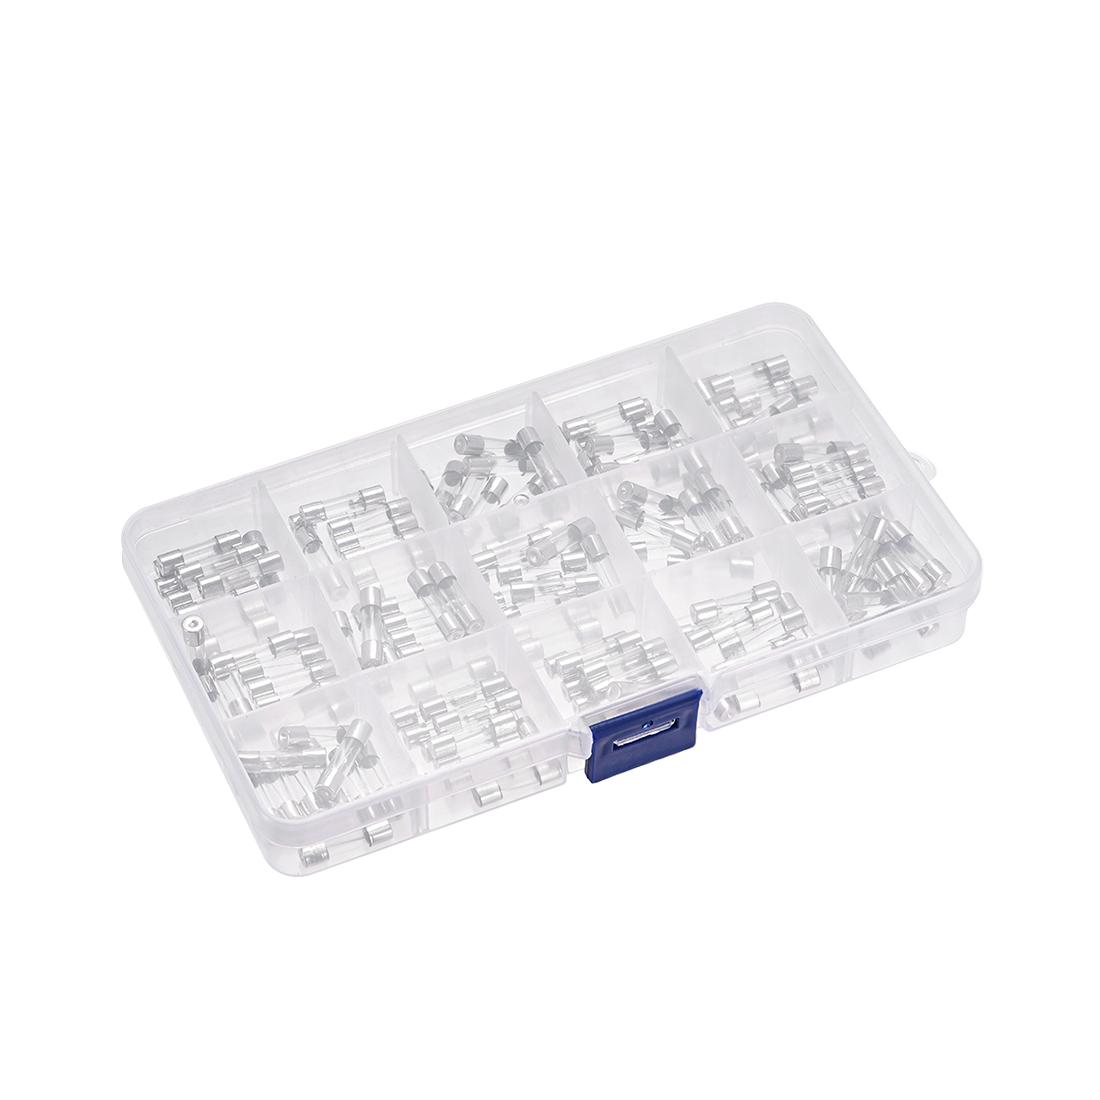 15 types Fast Blow Glass Cartridge Fuse Tube Fuse Kits 250V 1Sets